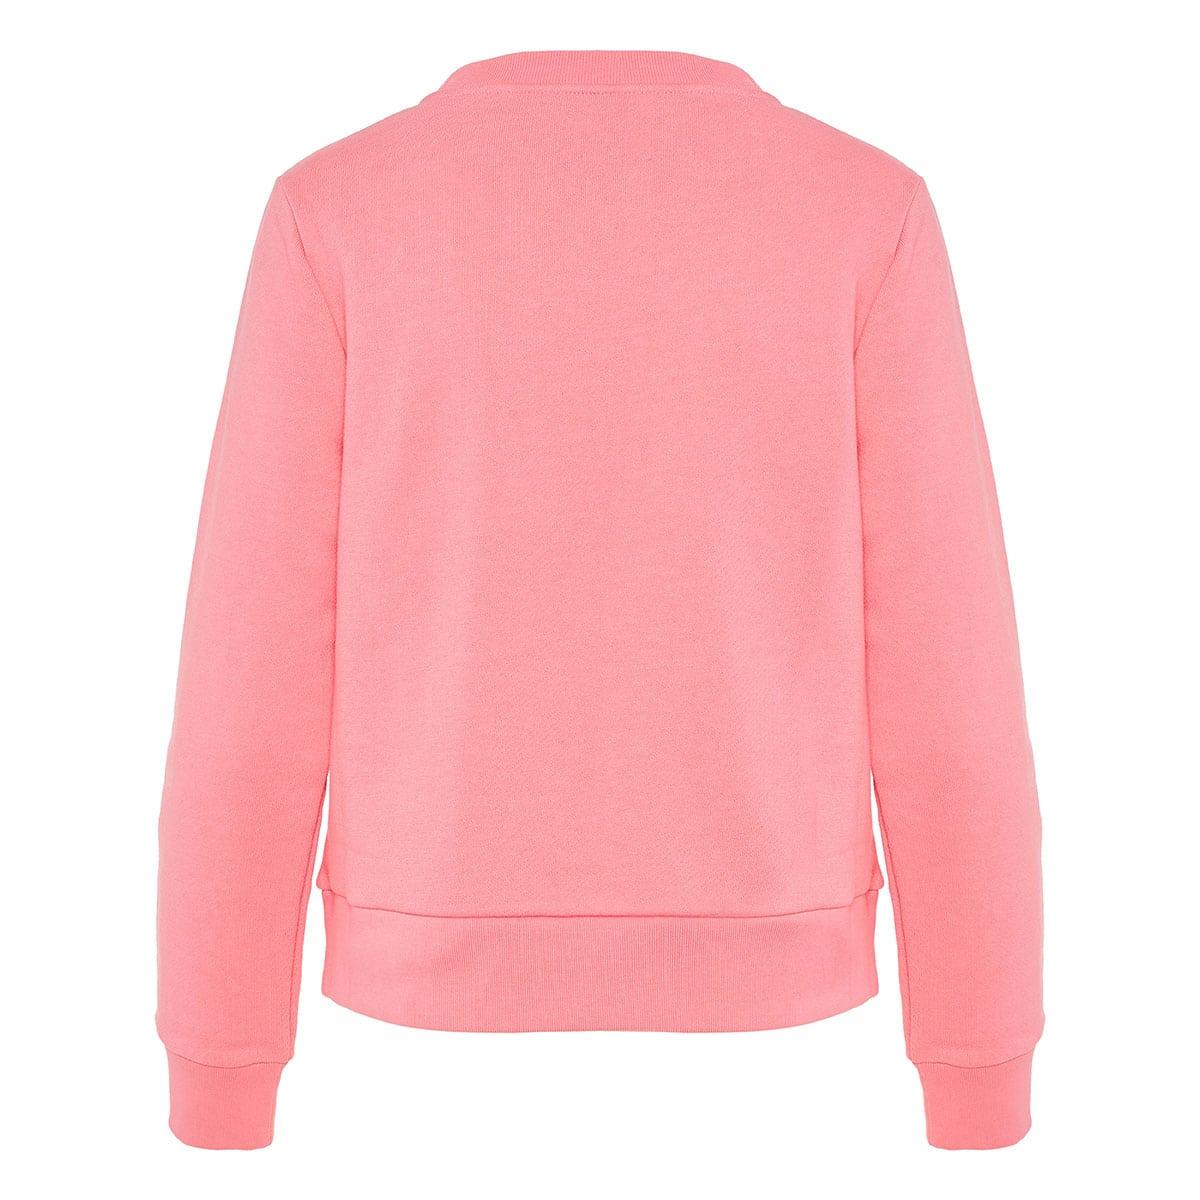 Gucci Sexiness oversized sweatshirt